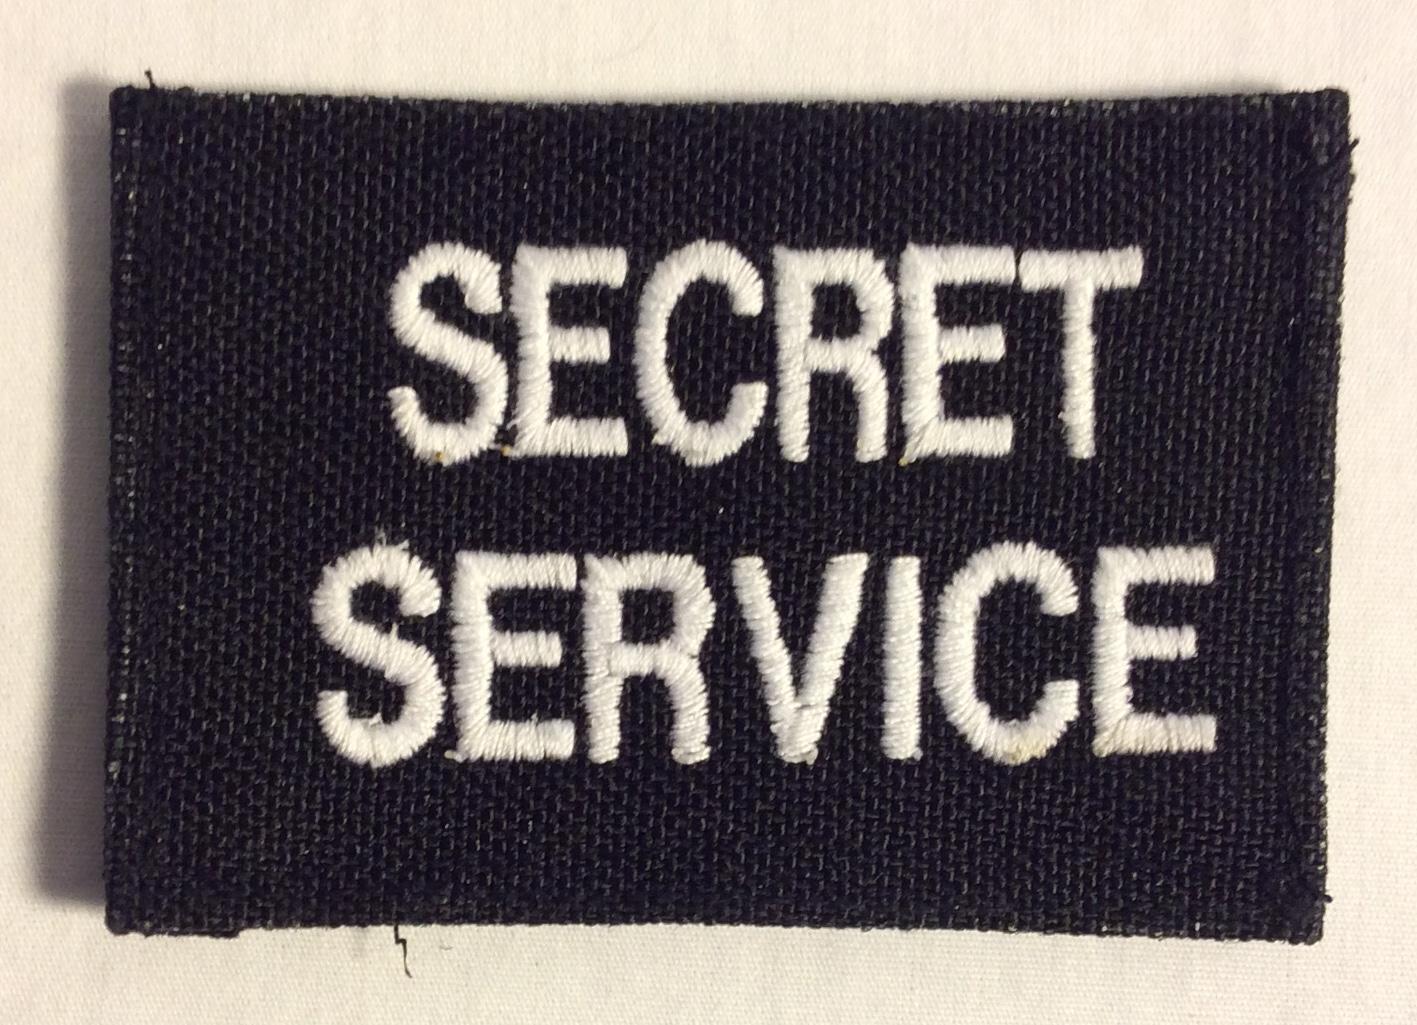 Secret Service Velcro Patches, White